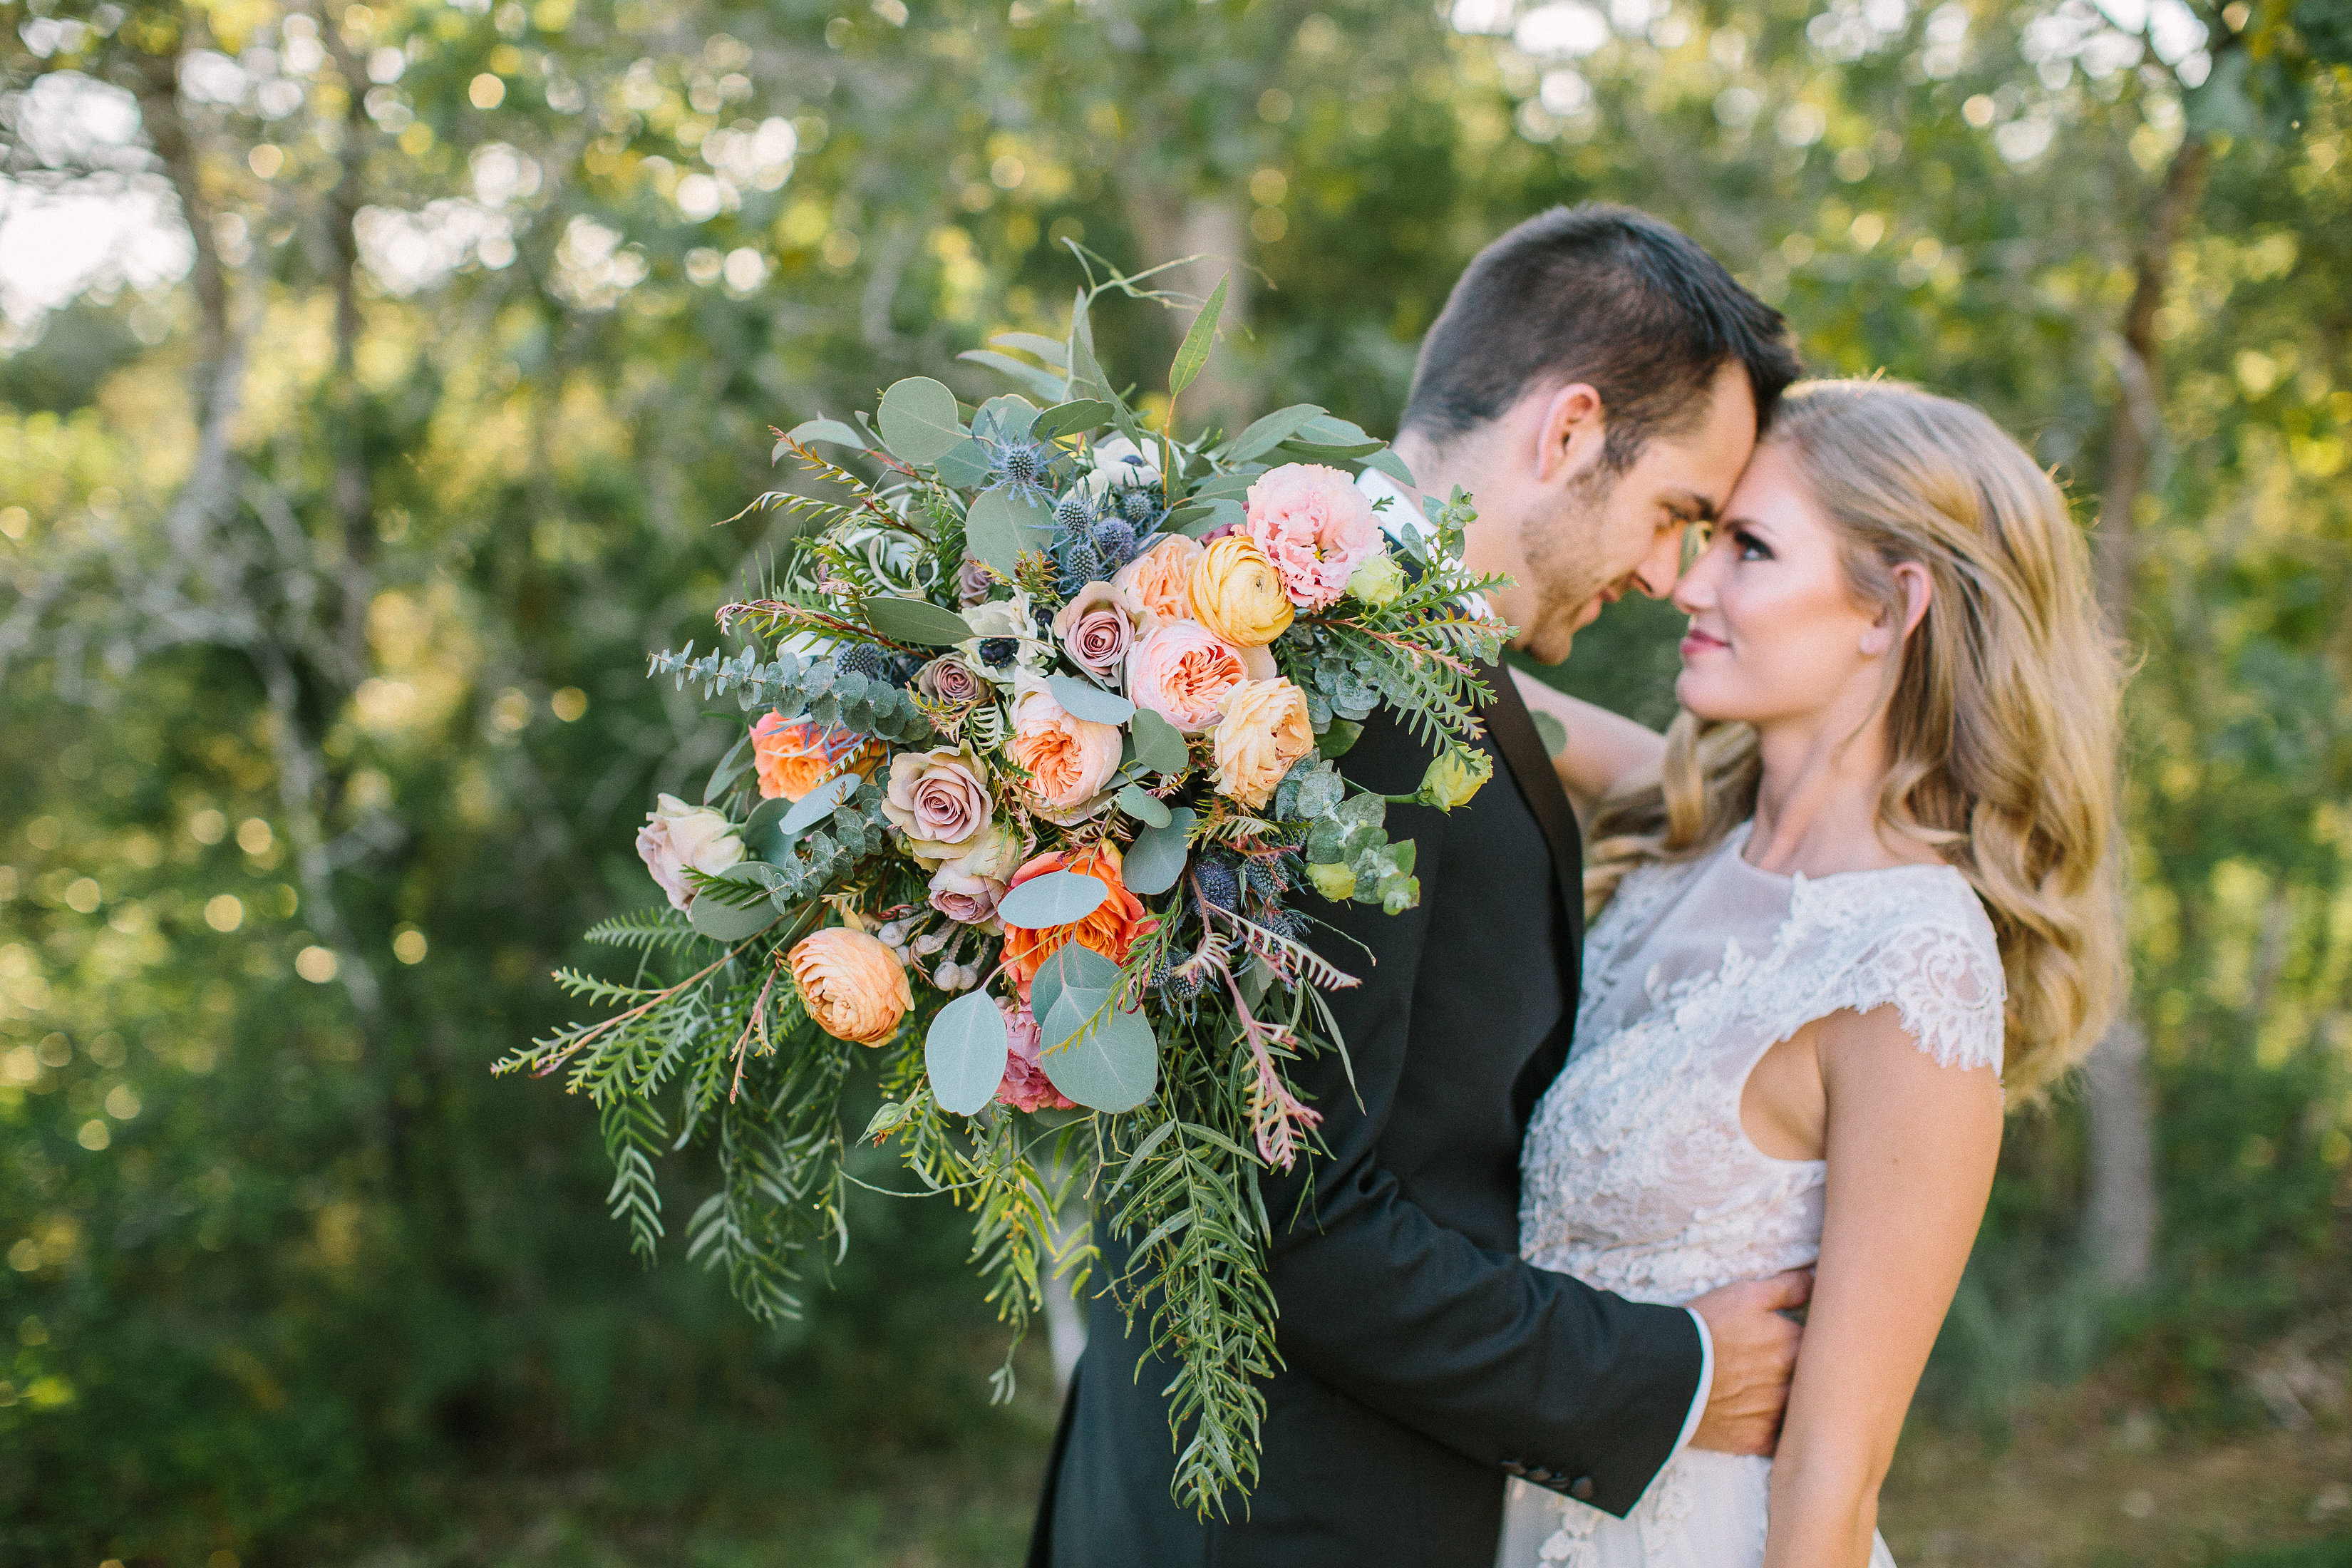 Ellen-Ashton-Photography-Peach-Creek-Ranch-Weddings-Wed-and-Prosper229